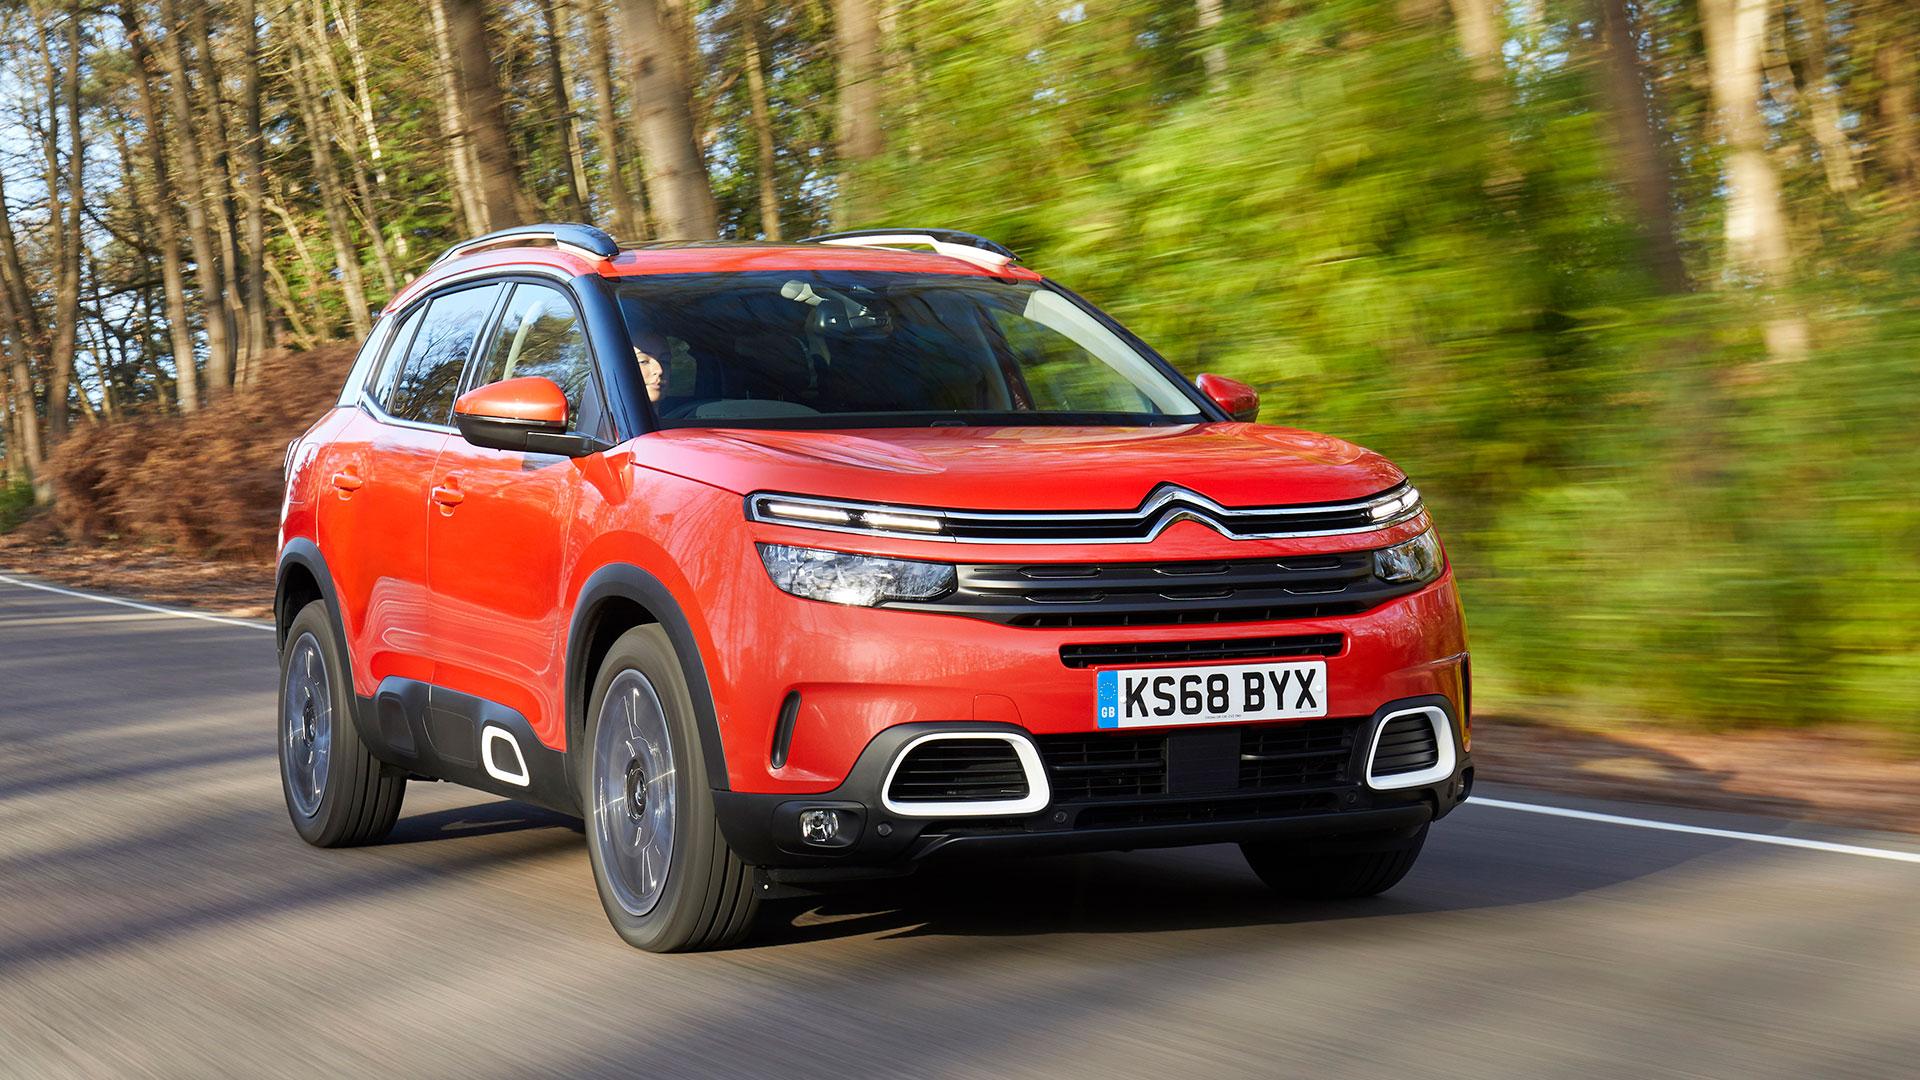 Auto Trade In Value >> Citroen C5 Aircross SUV (2018 - ) review | Auto Trader UK